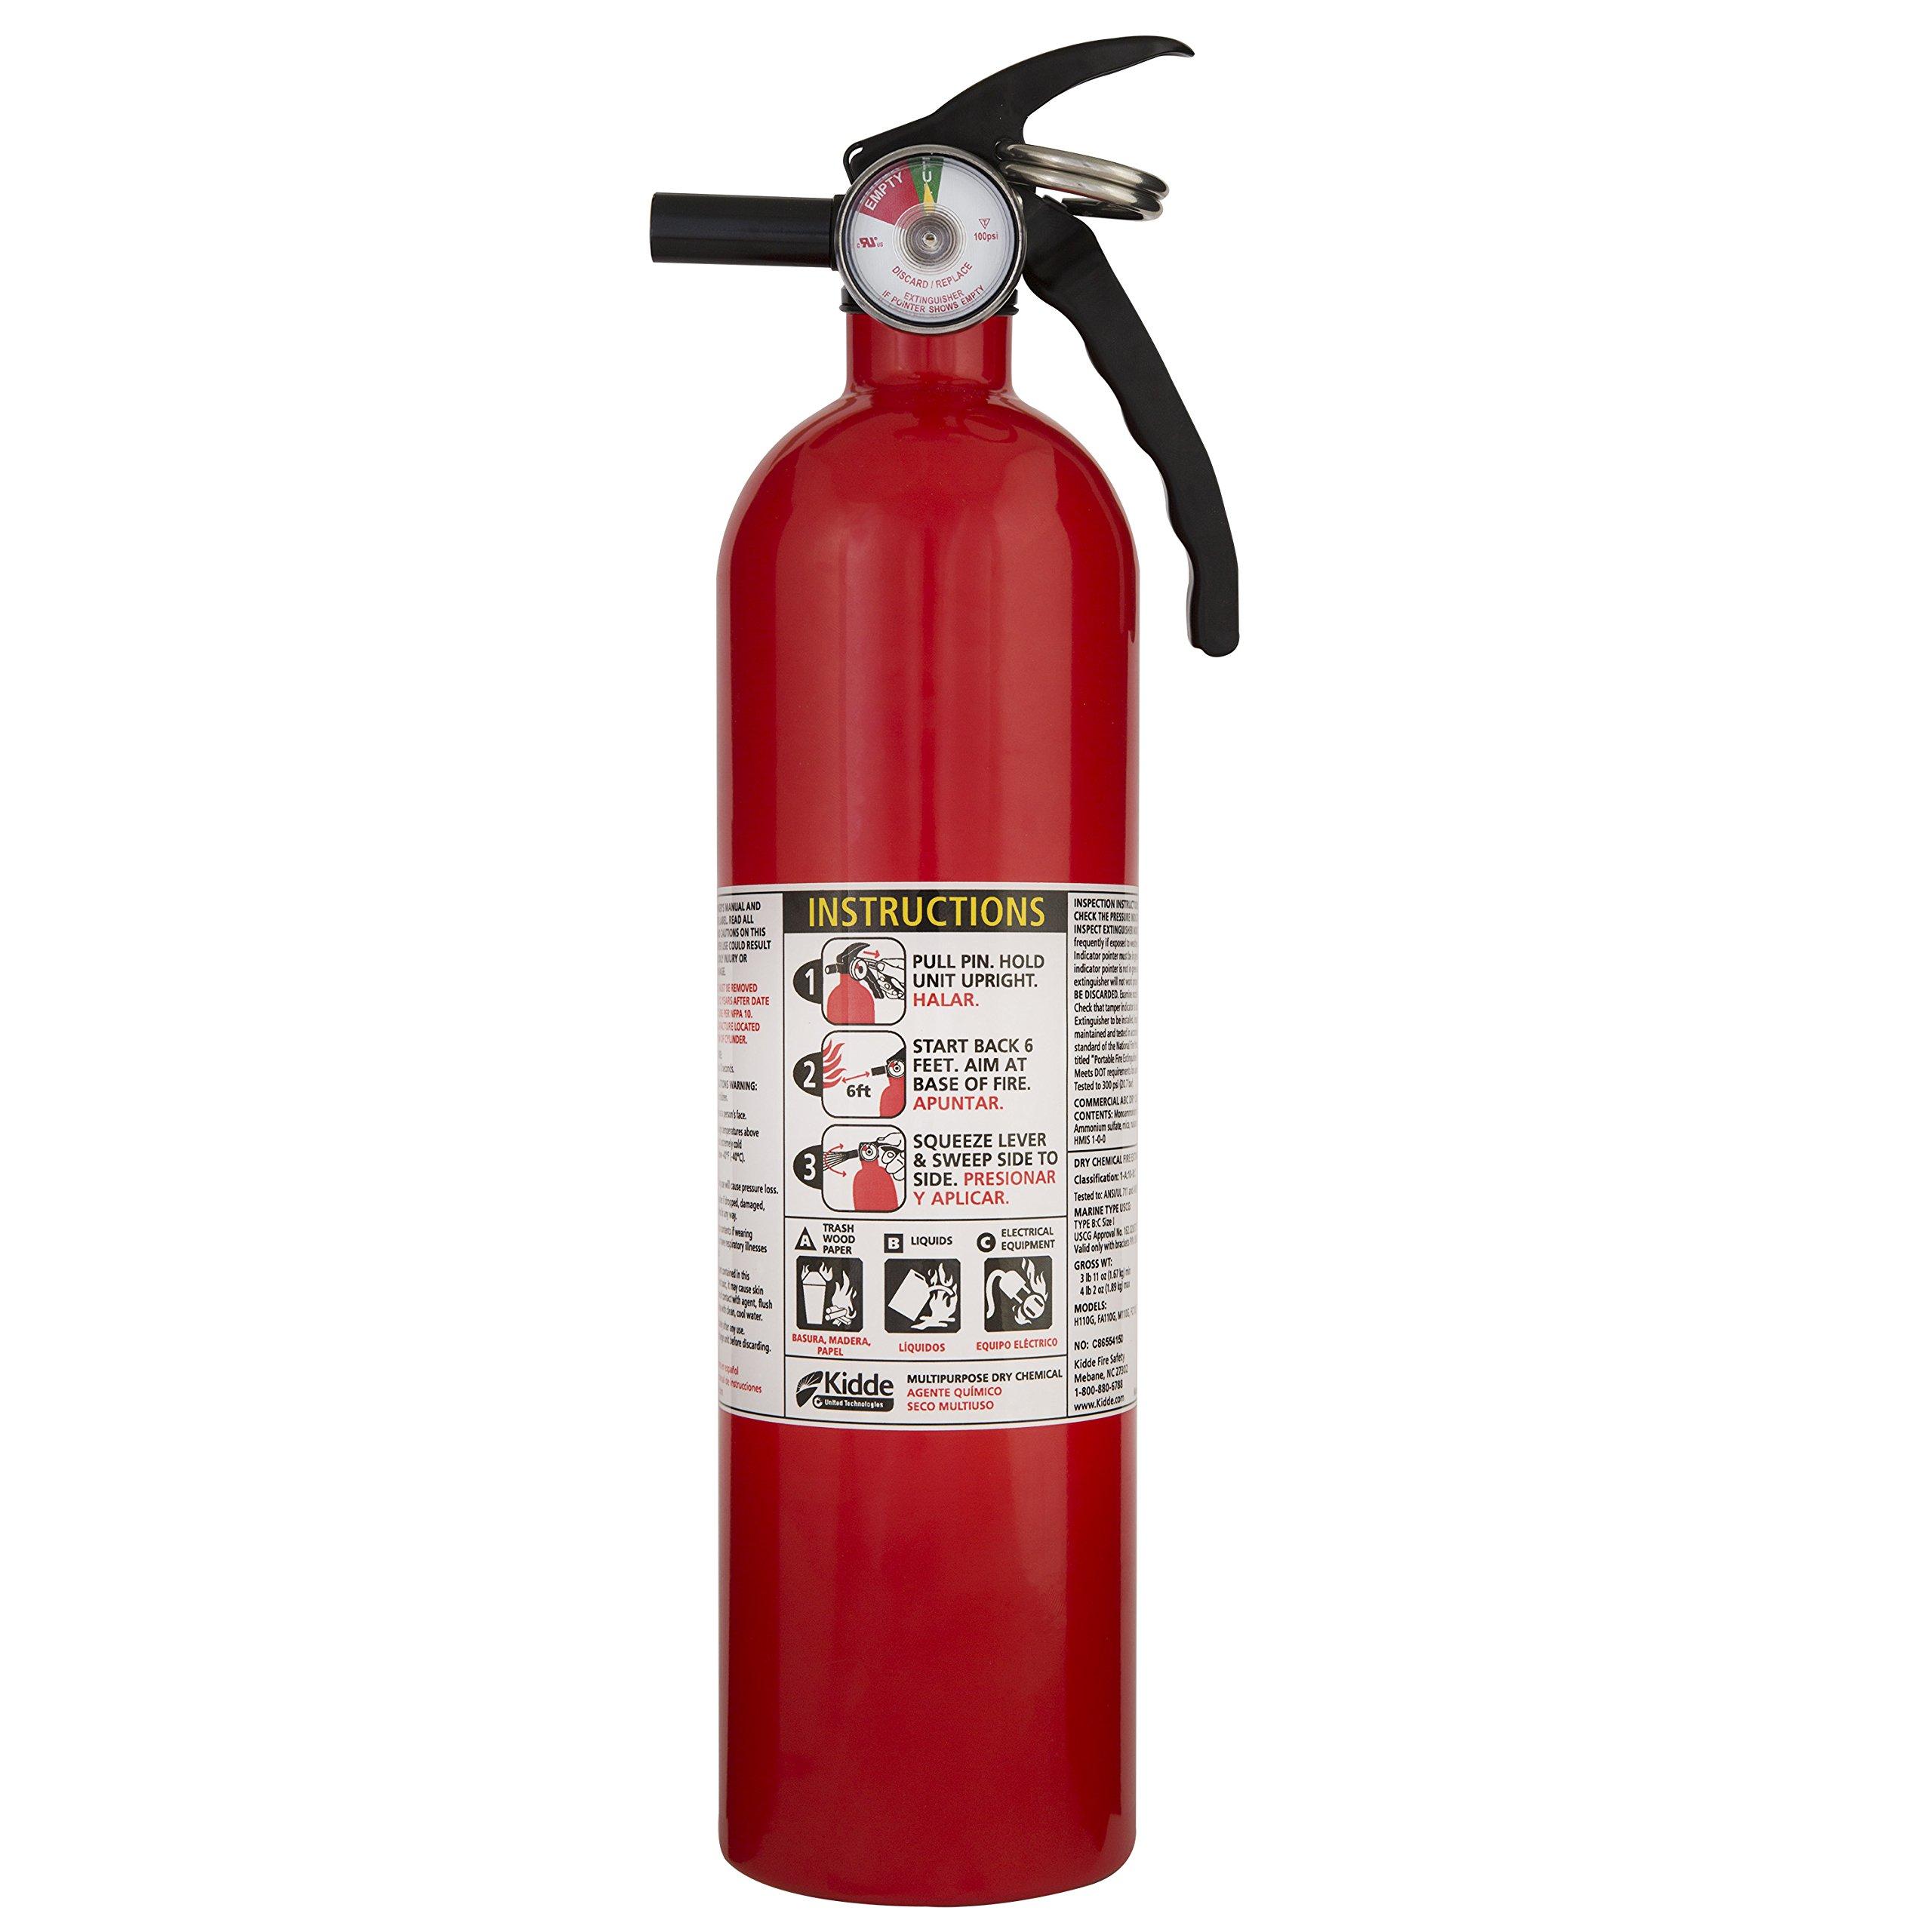 Kidde FA110 Multi Purpose Fire Extinguisher 1A10BC, 4-pack by Kidde